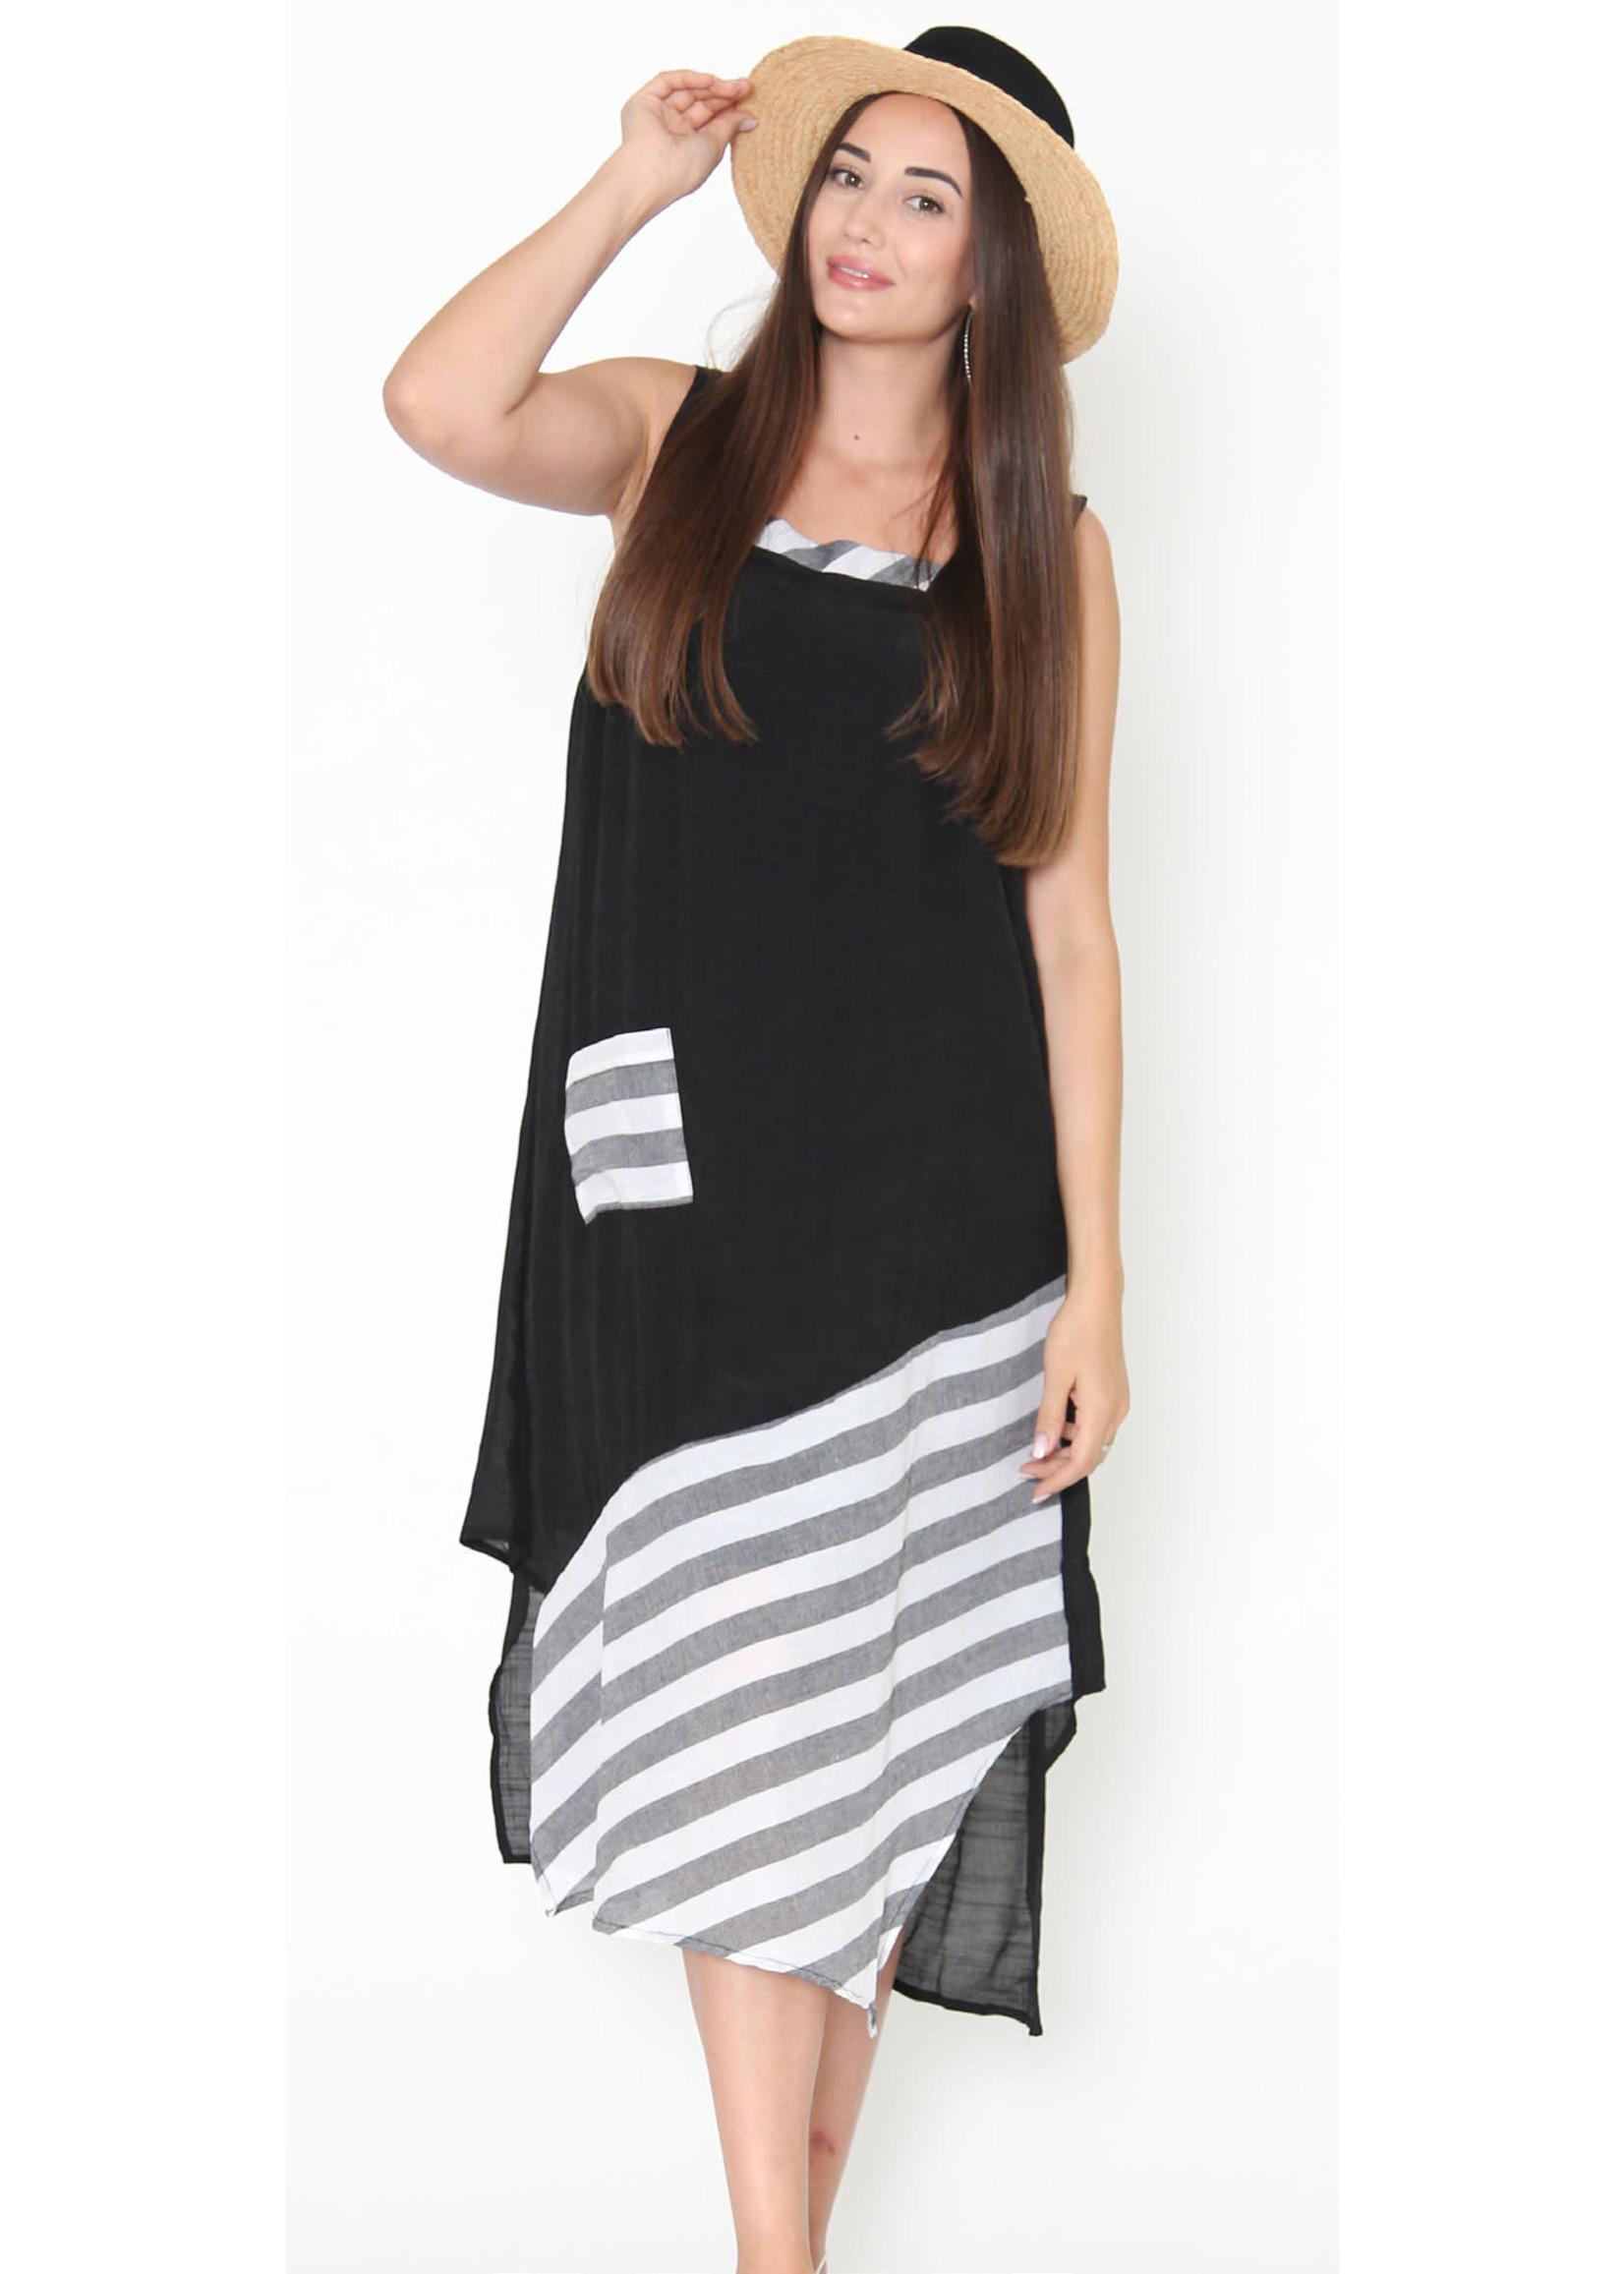 Funsport Black & White Dress